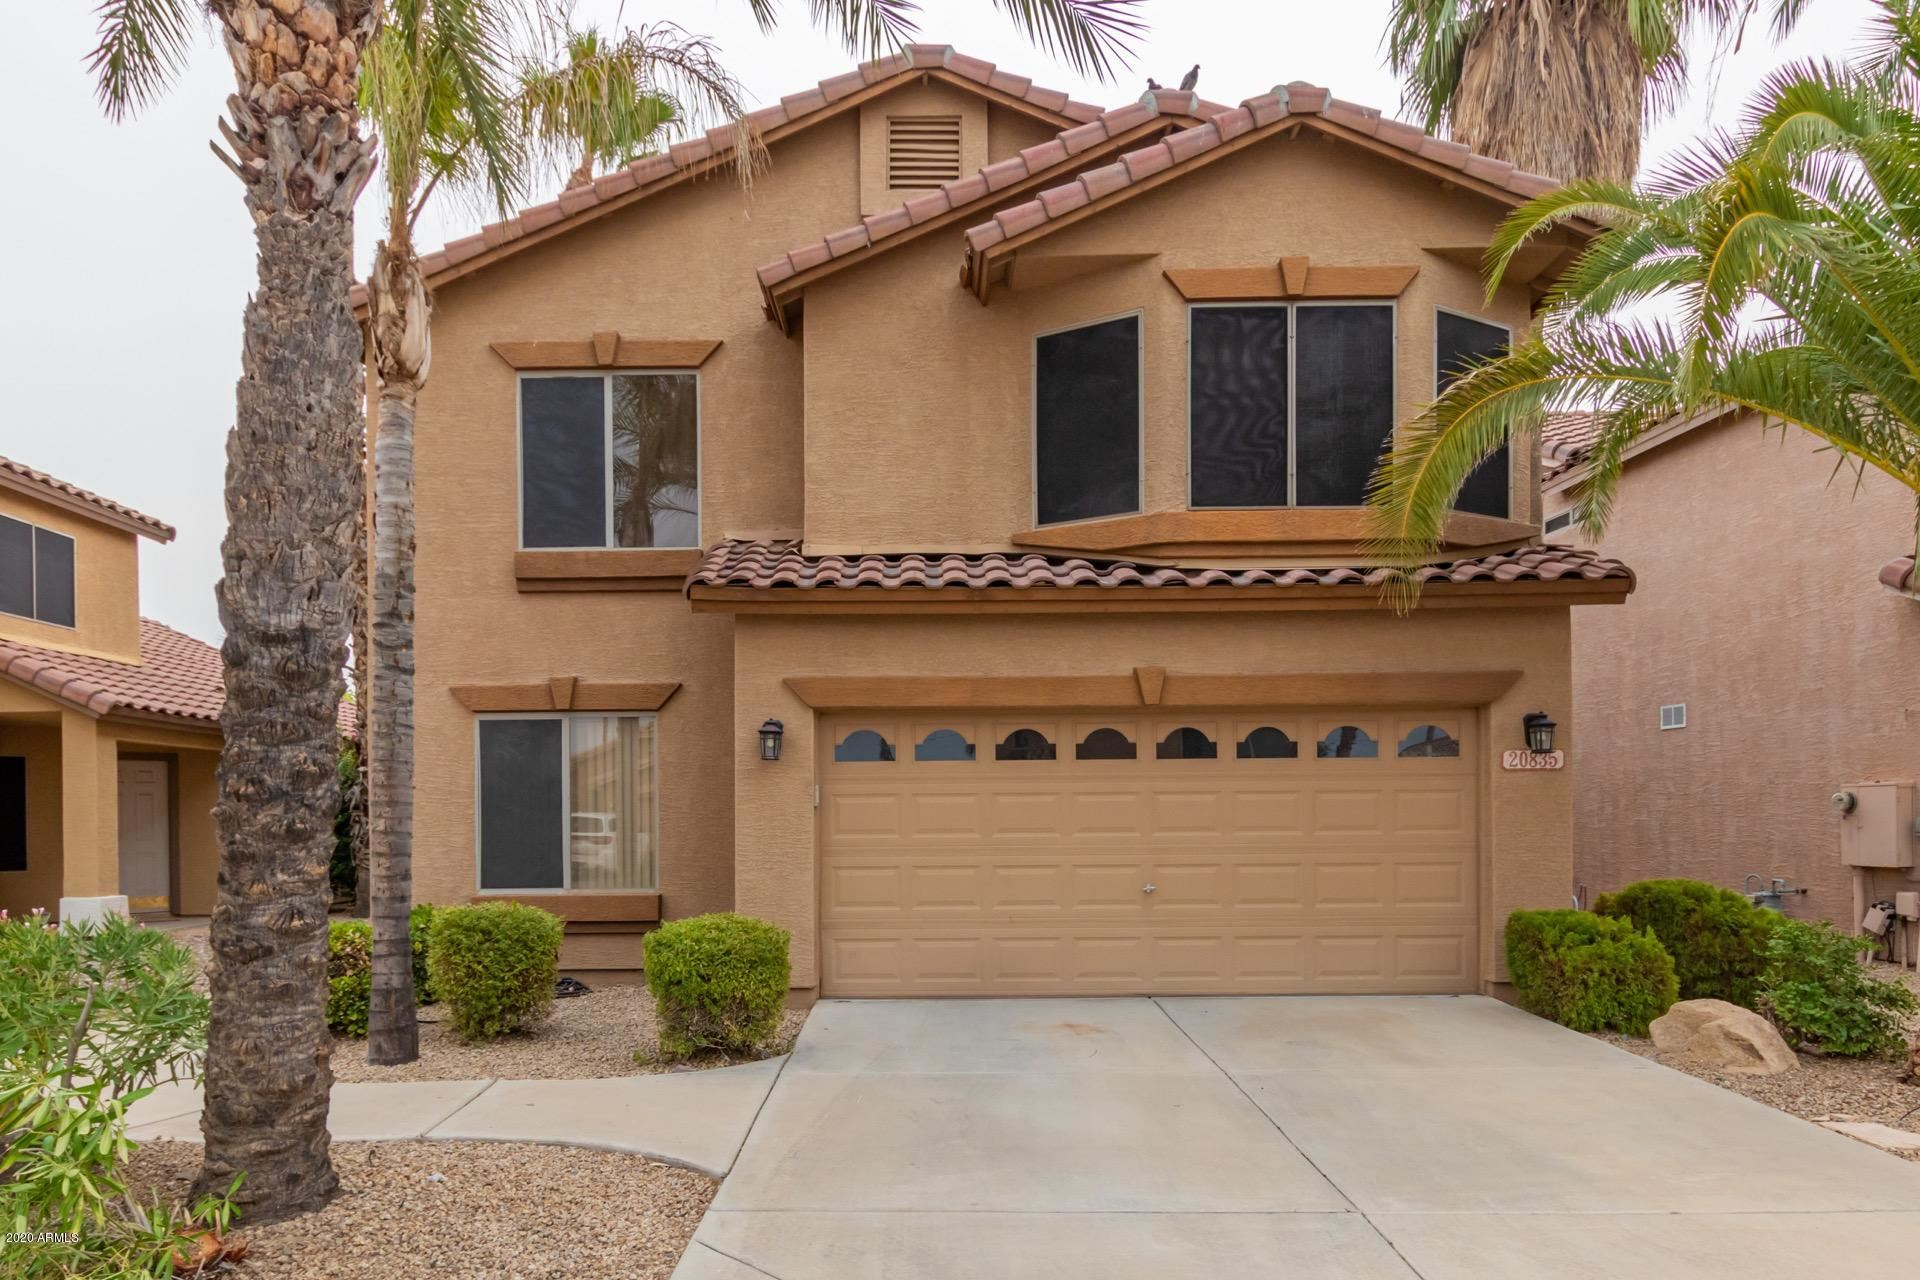 20835 N 7TH Place, Phoenix, AZ 85024 - MLS#: 6131379